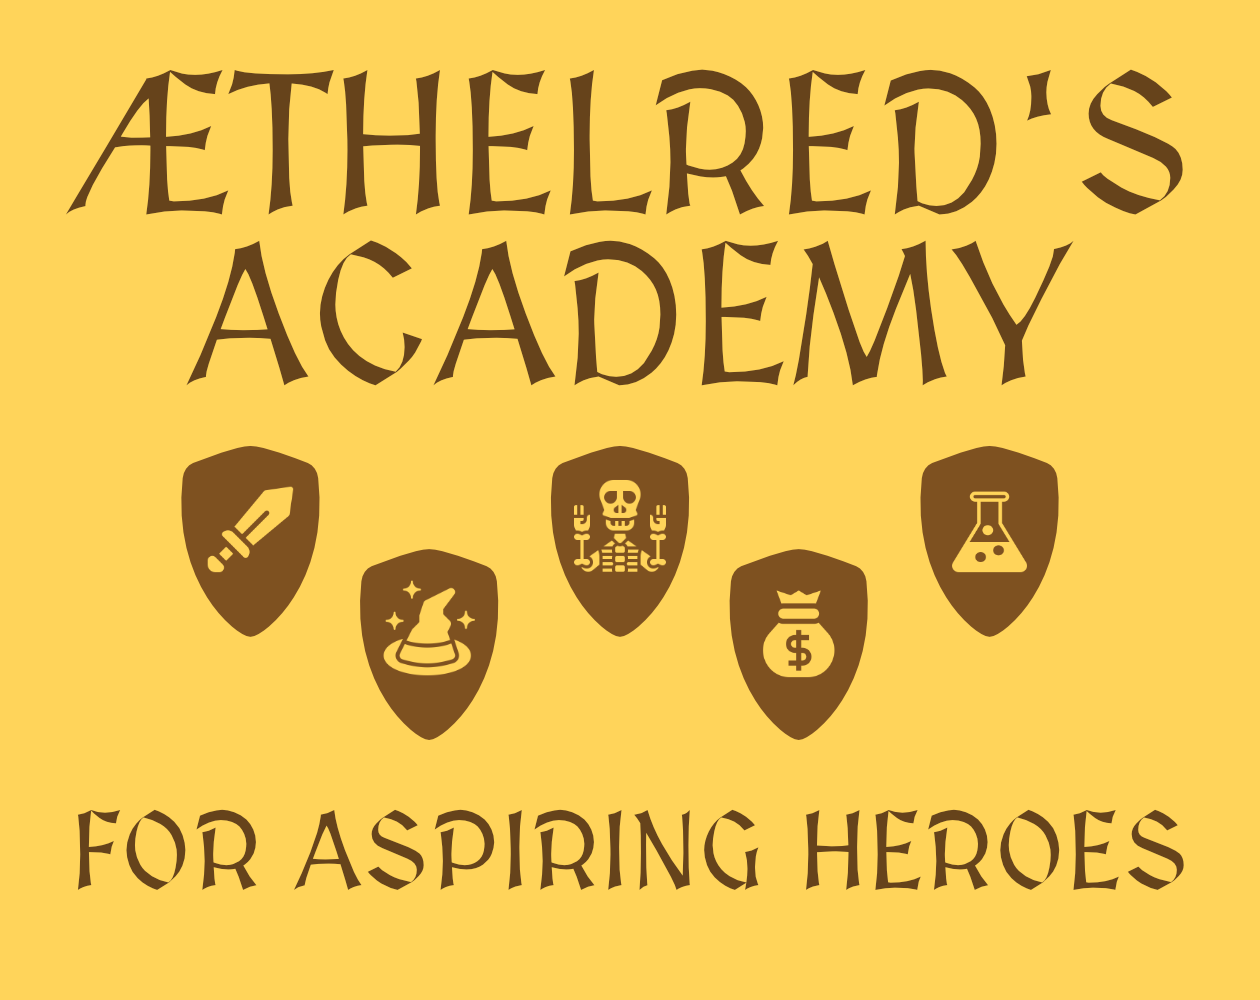 Æthelred's Academy for Aspiring Heroes logo